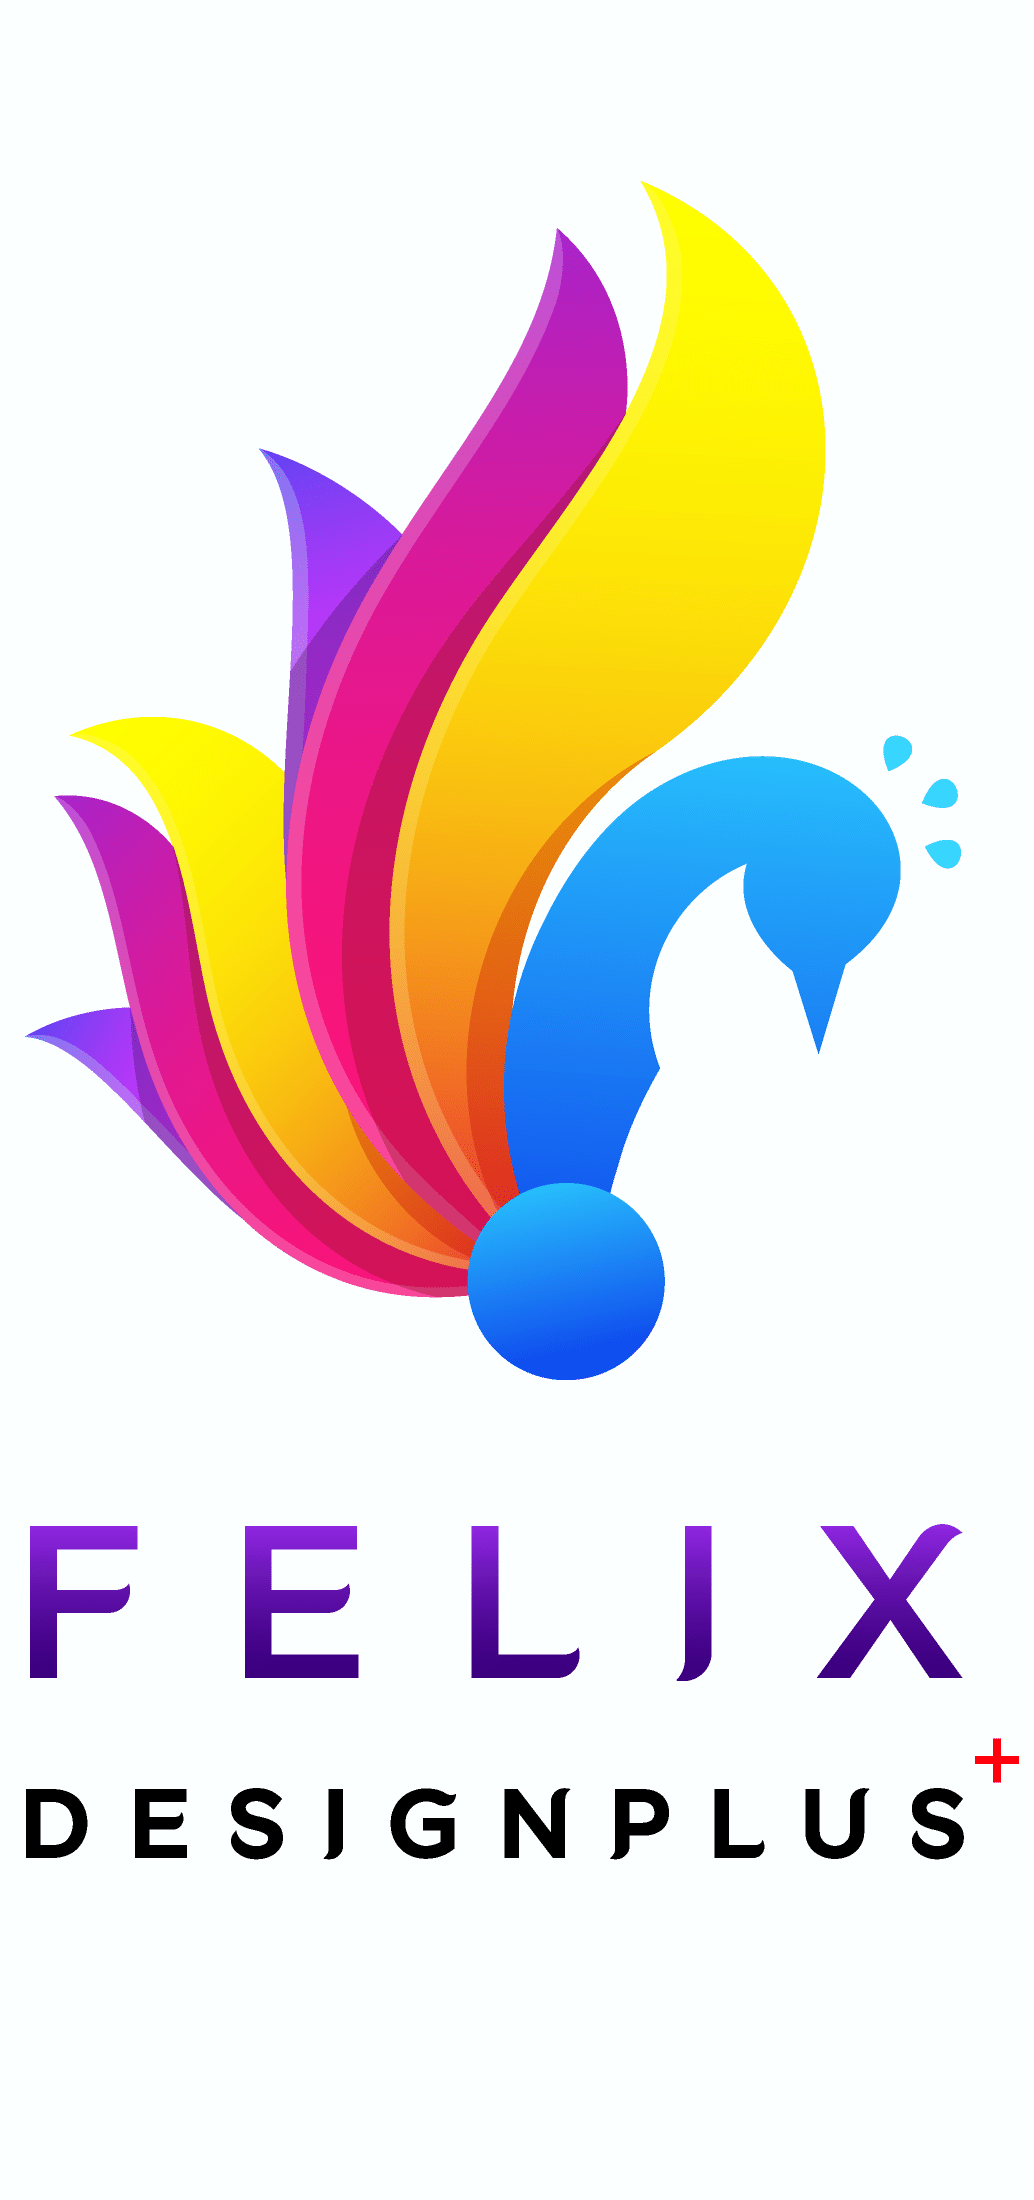 Felix Designplus